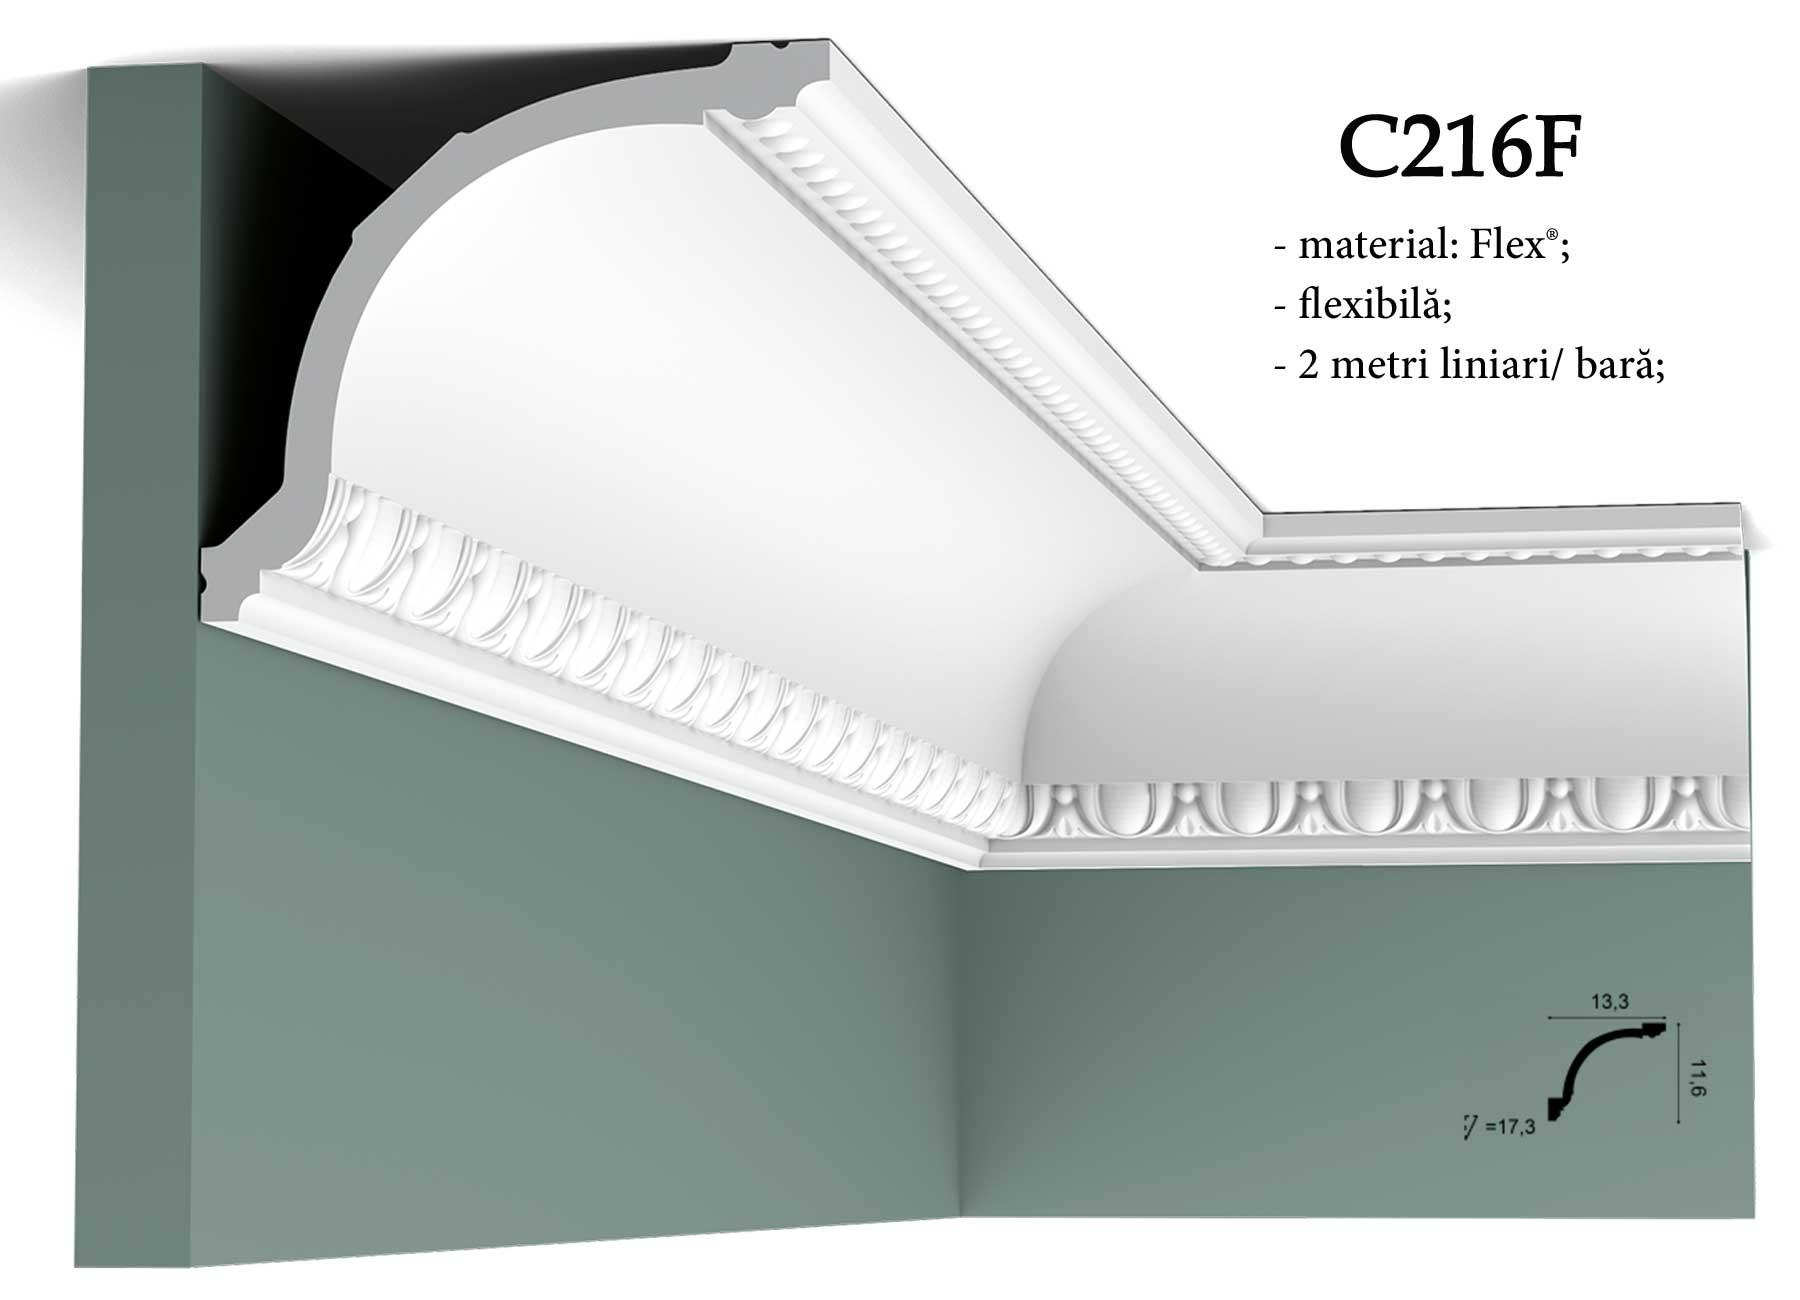 Cornisa flexibila pentru tavan Orac Decor C216F